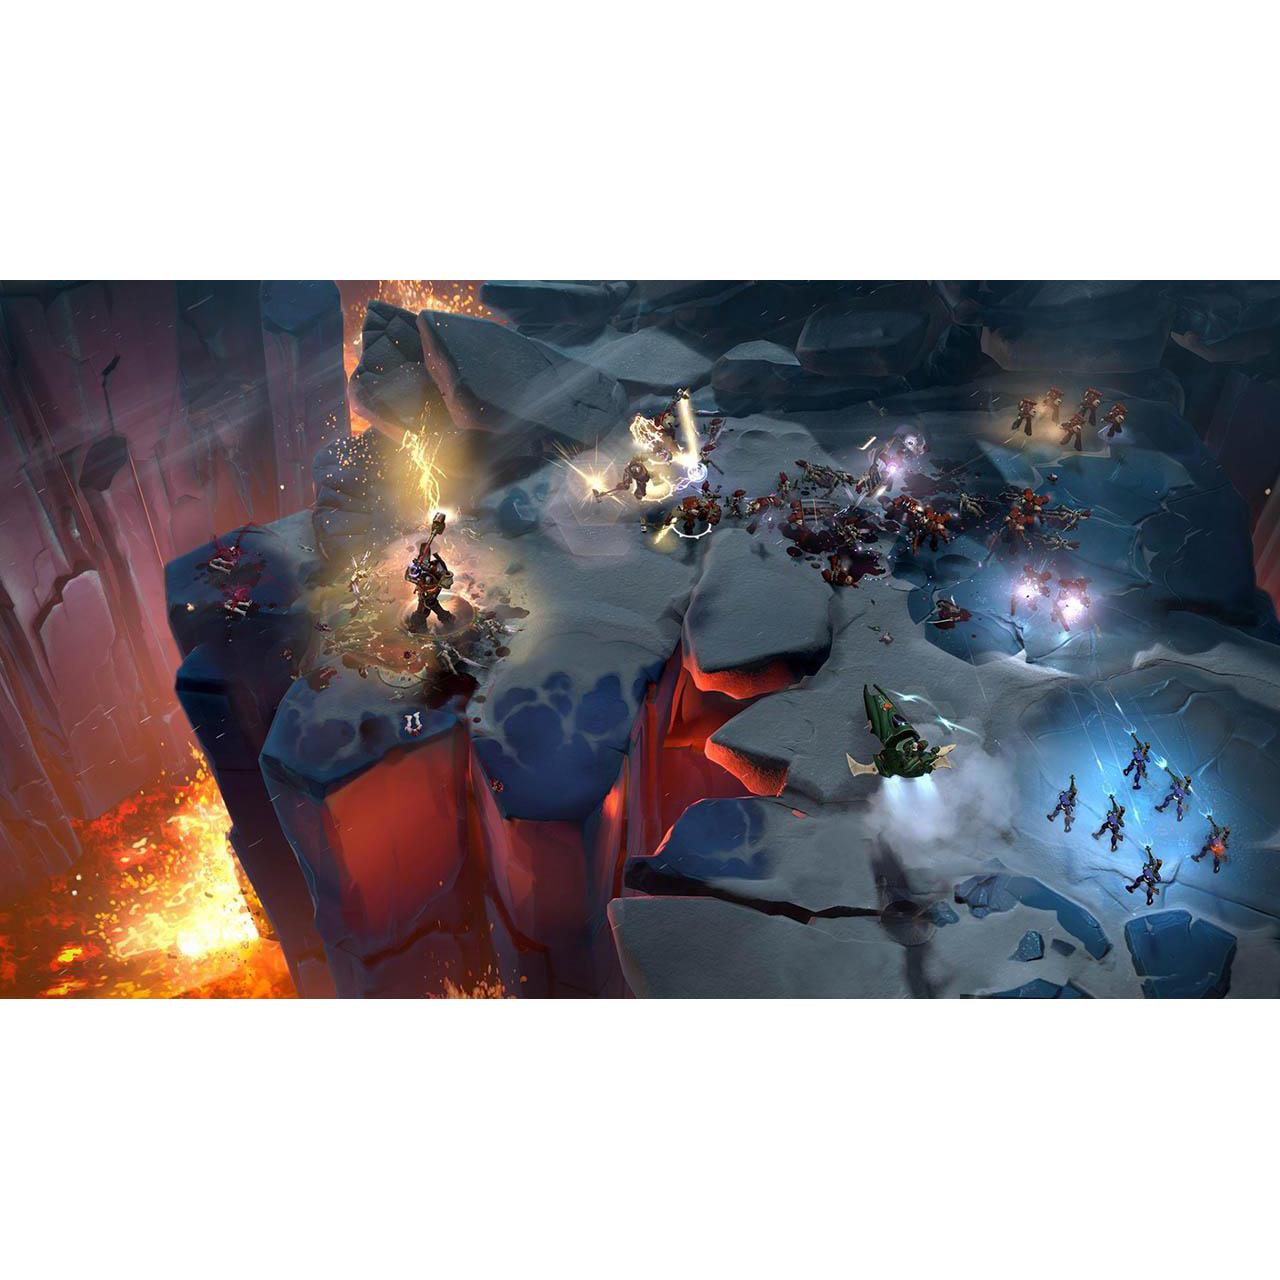 Joc Dawn Of War 3 Limited Edition pentru PC 6